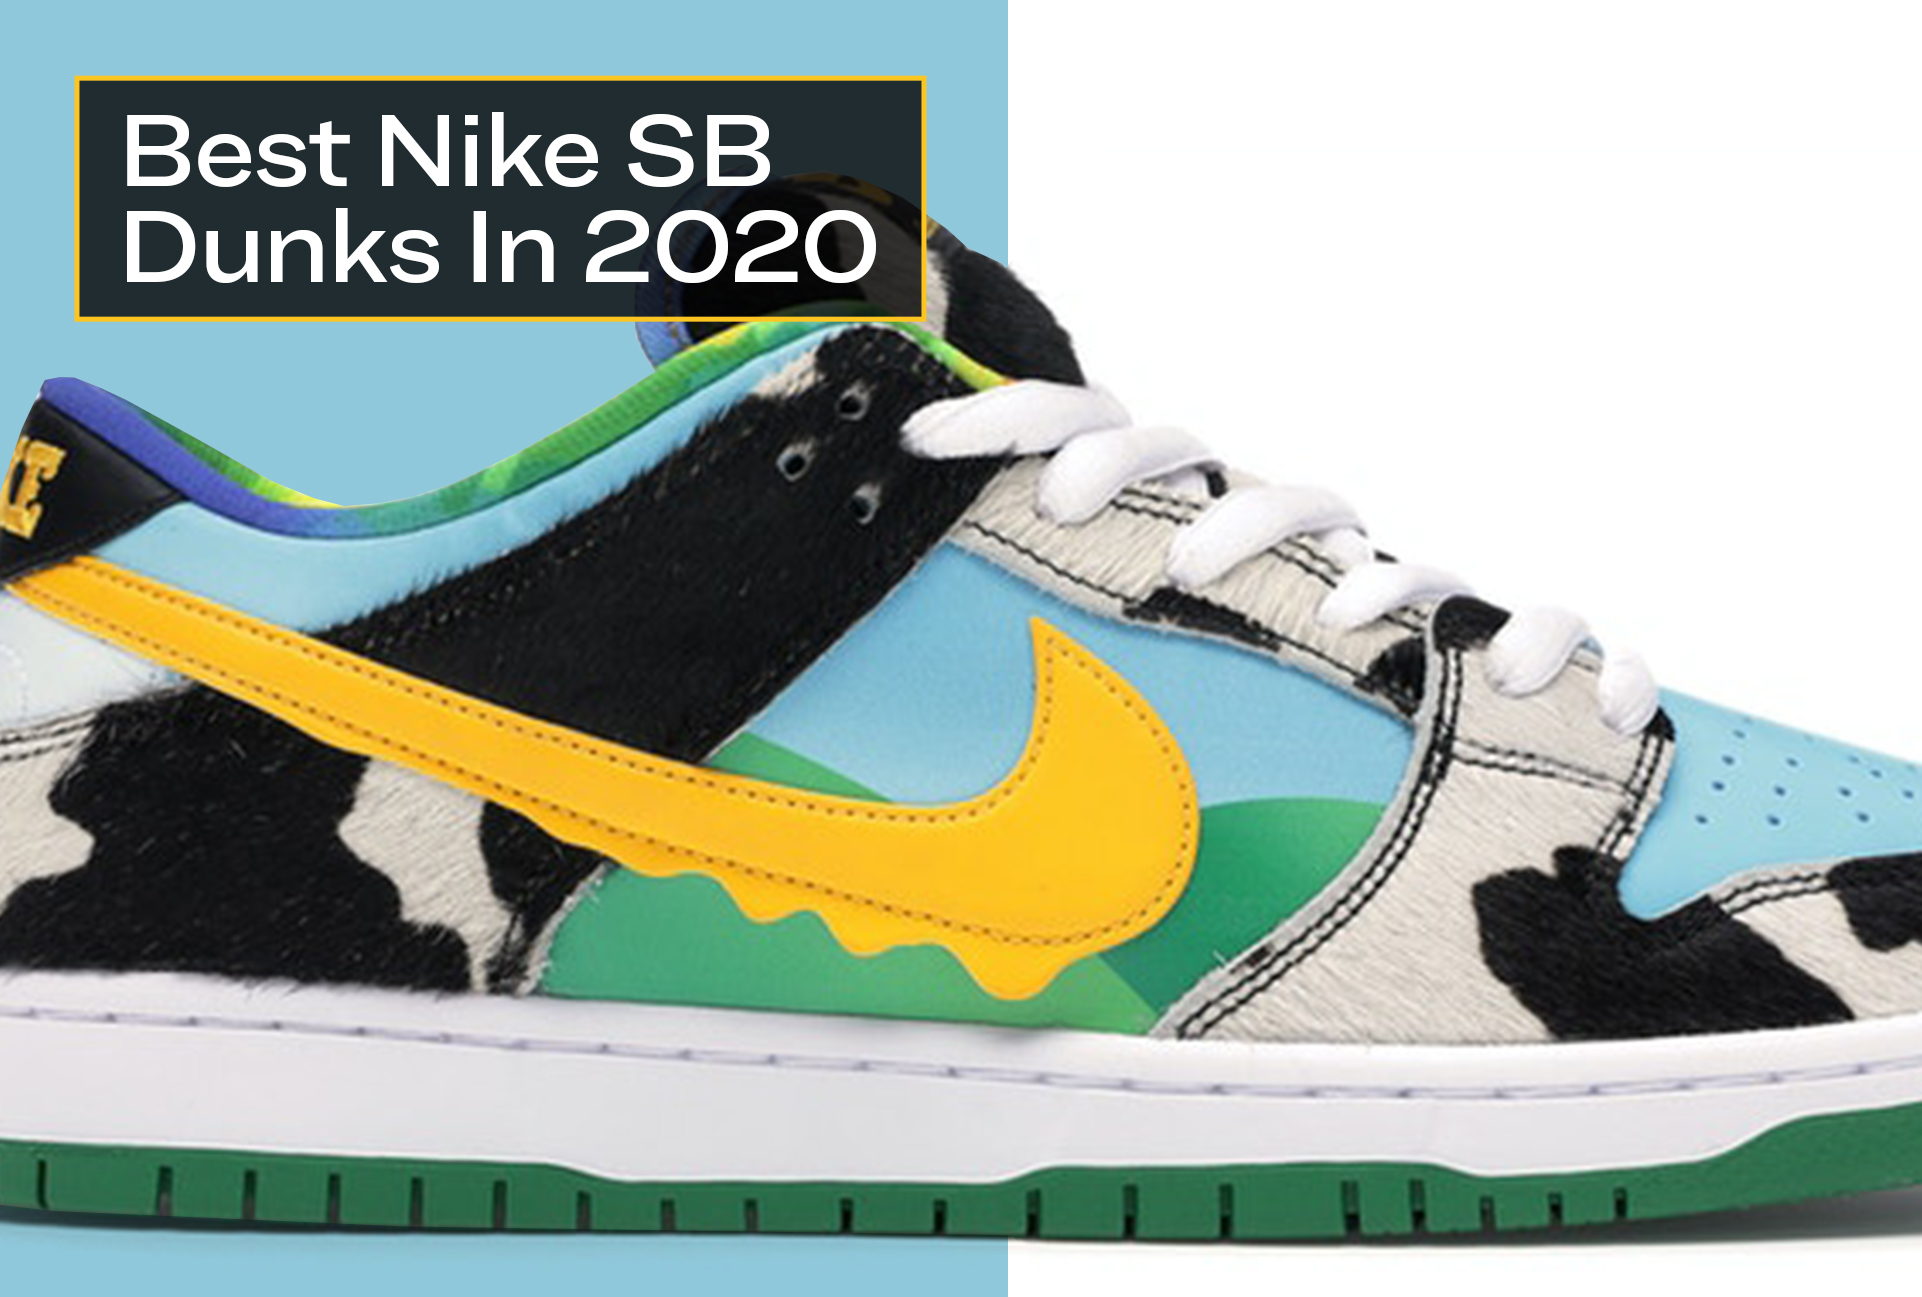 new nike sbs